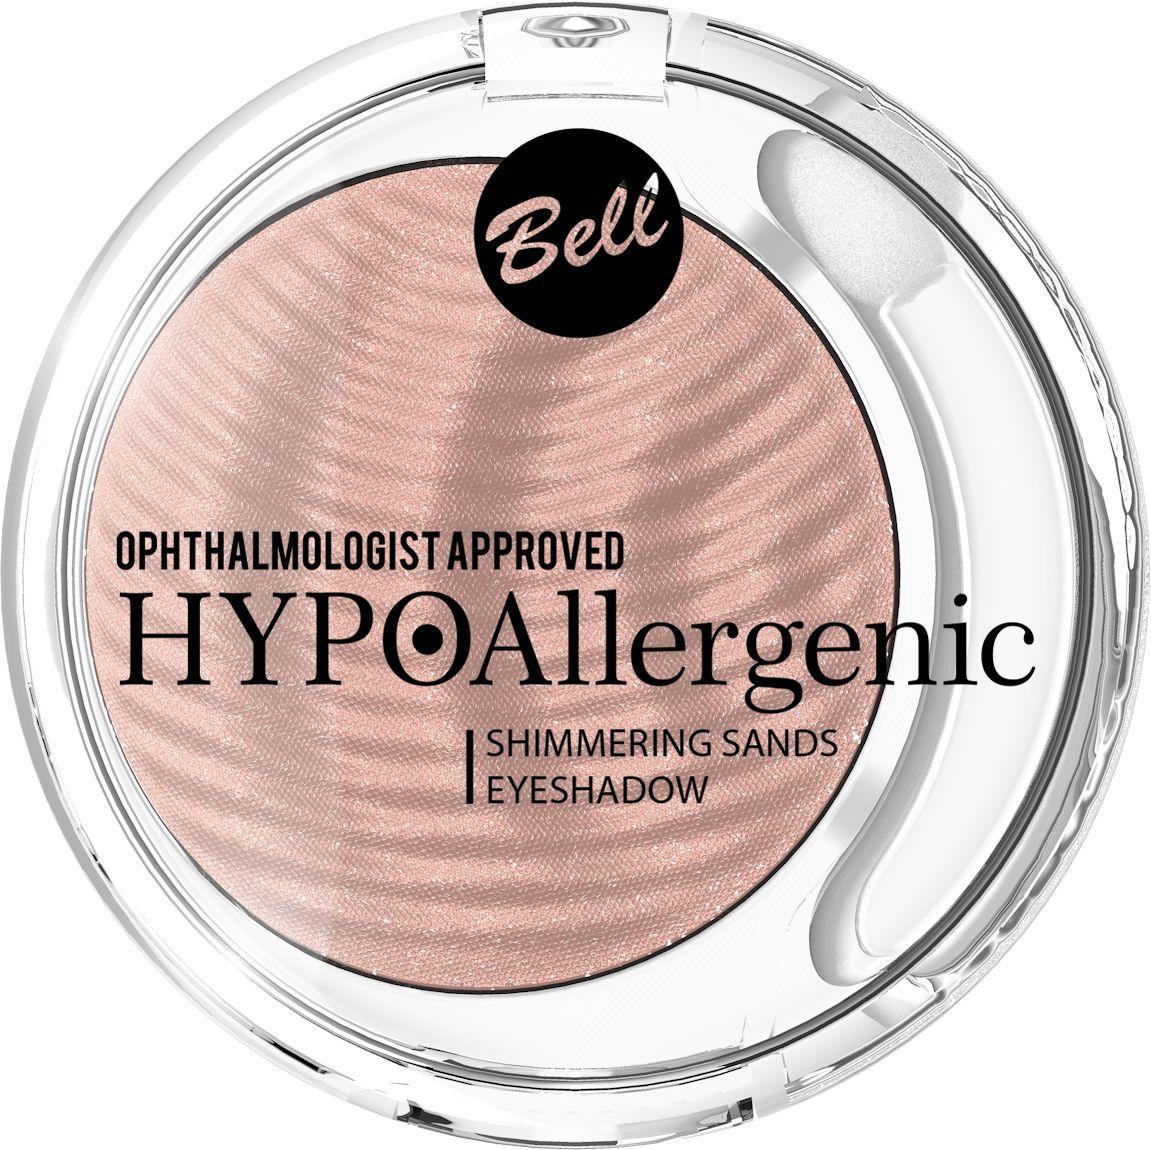 Bell Hypoallergenic Кремовые тени для век Shimmering Sands Eyeshadow, Тон №02BcssHA002